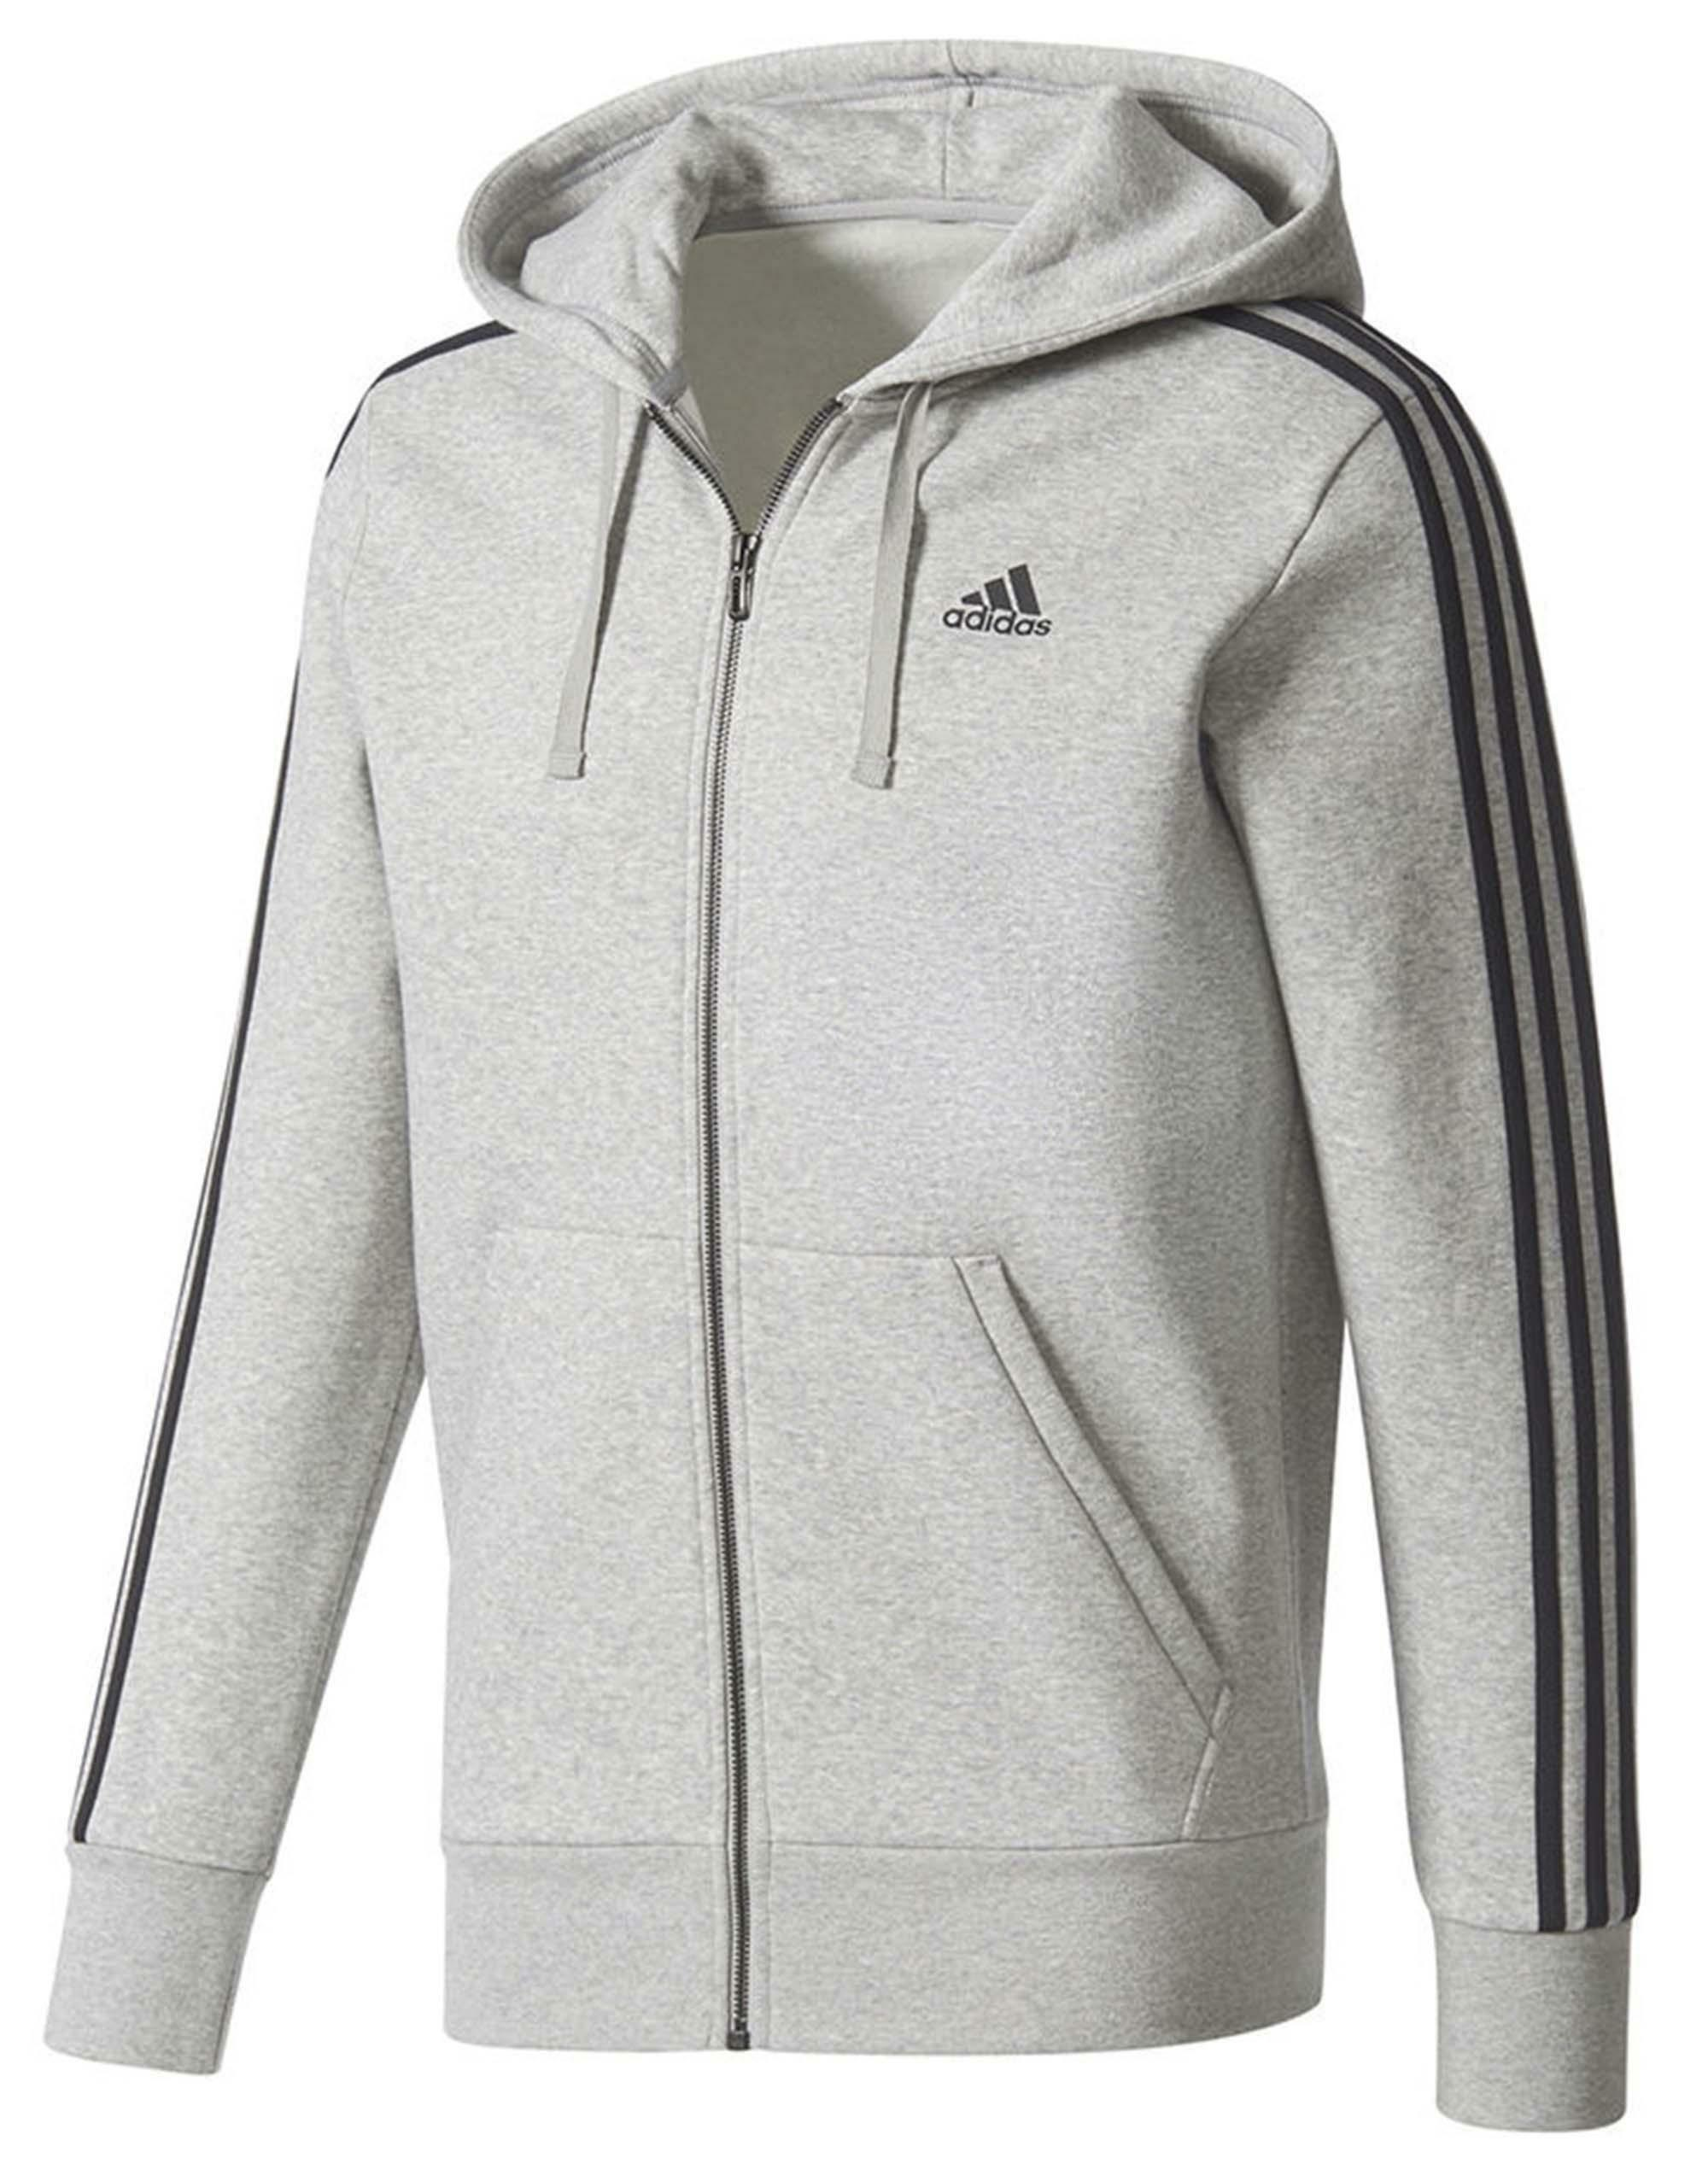 adidas adidas ess 3s giacchetto uomo grigio cf5056